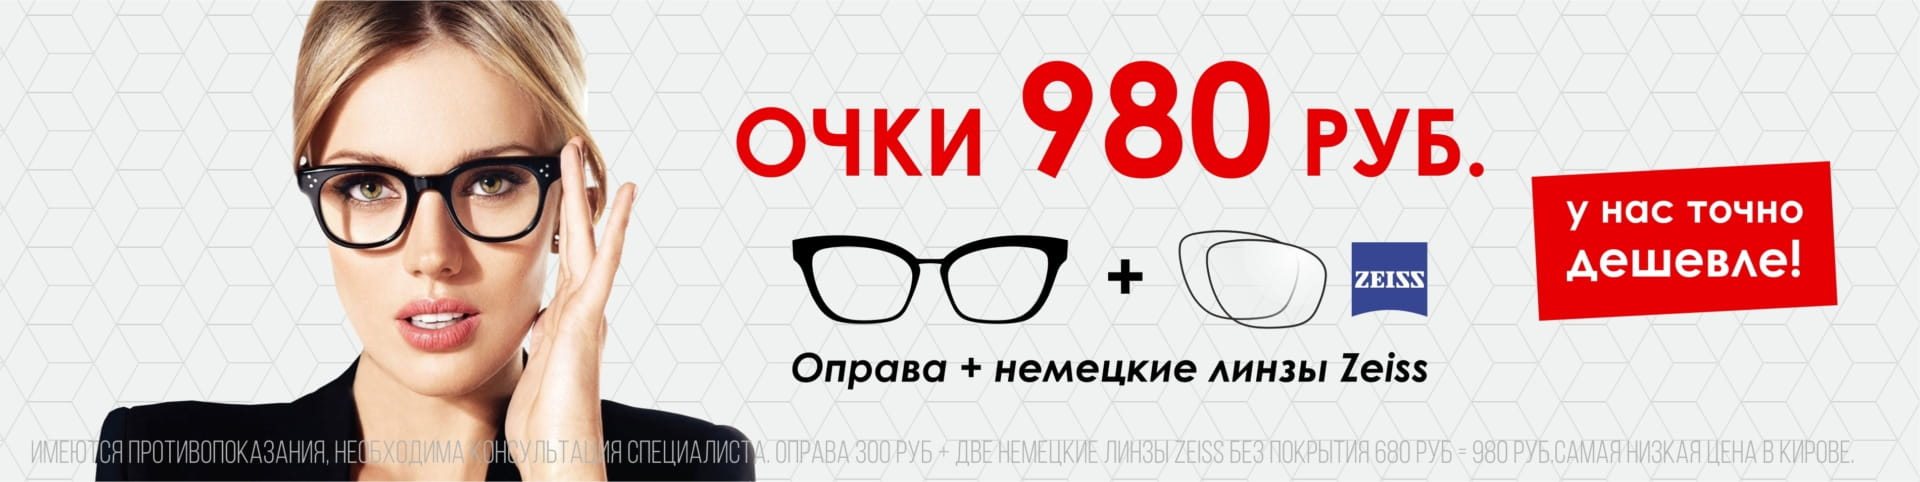 e425f2e5917f Главная - Люкс Оптика